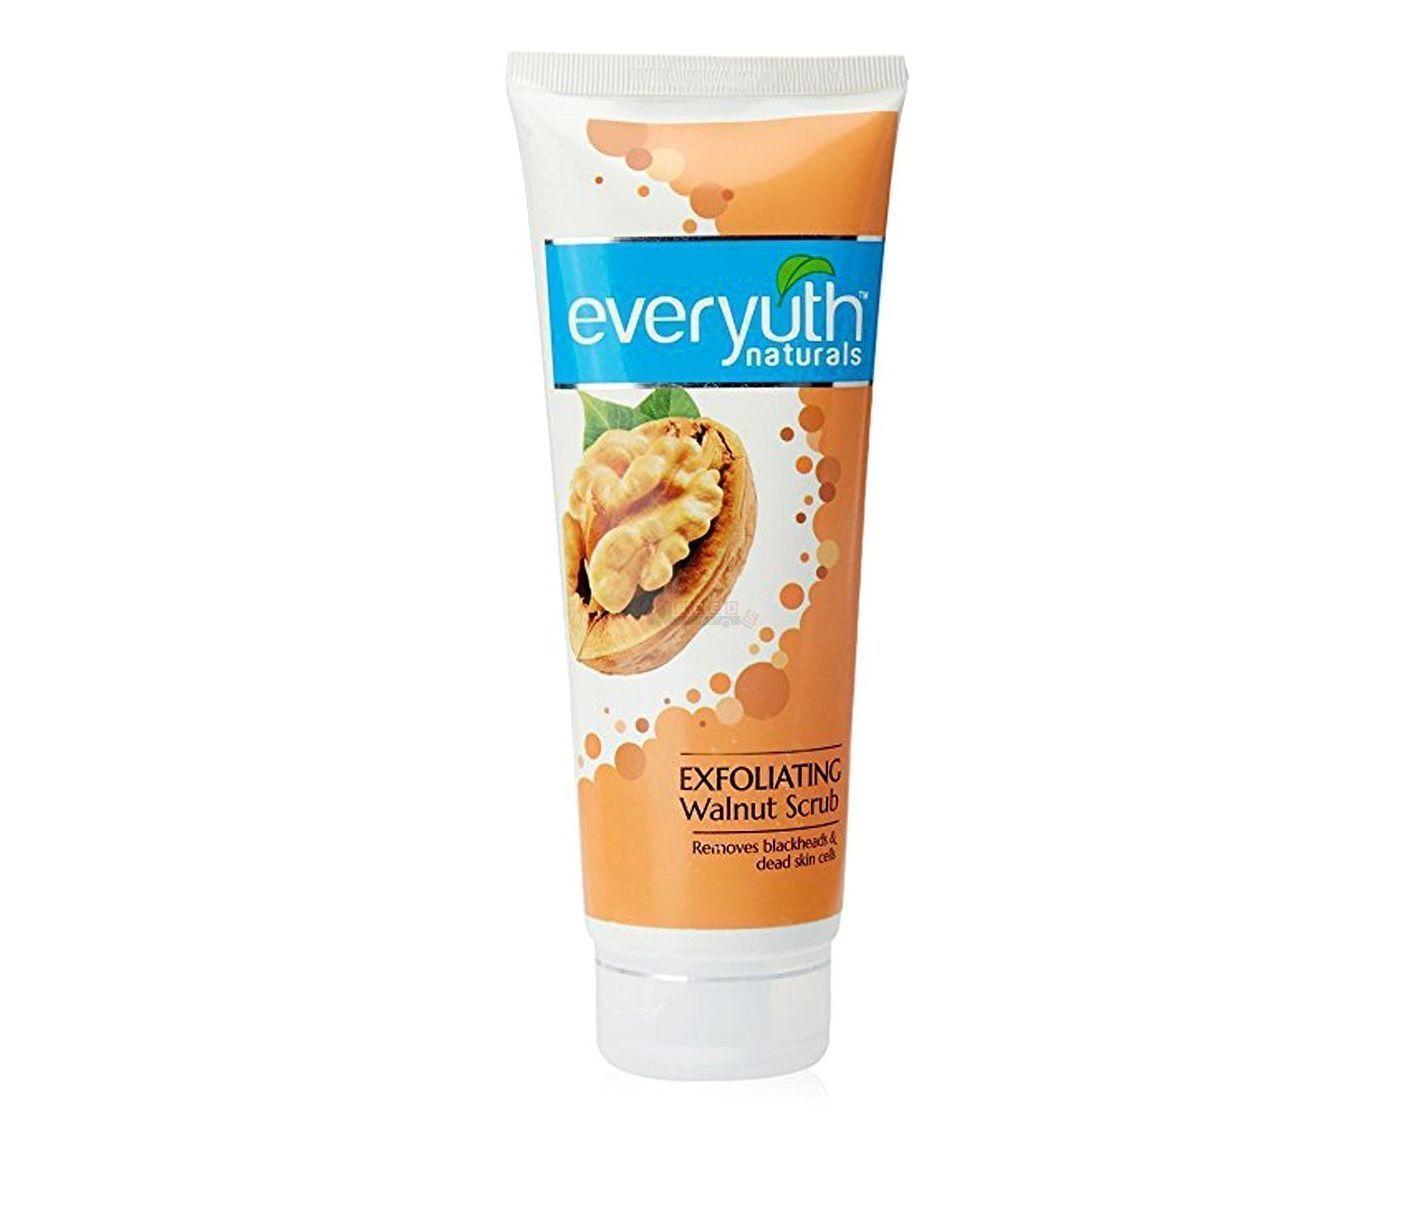 Everyuth Naturals Exfoliating Walnut Apricot Face Scrub 200 ml Free Ship